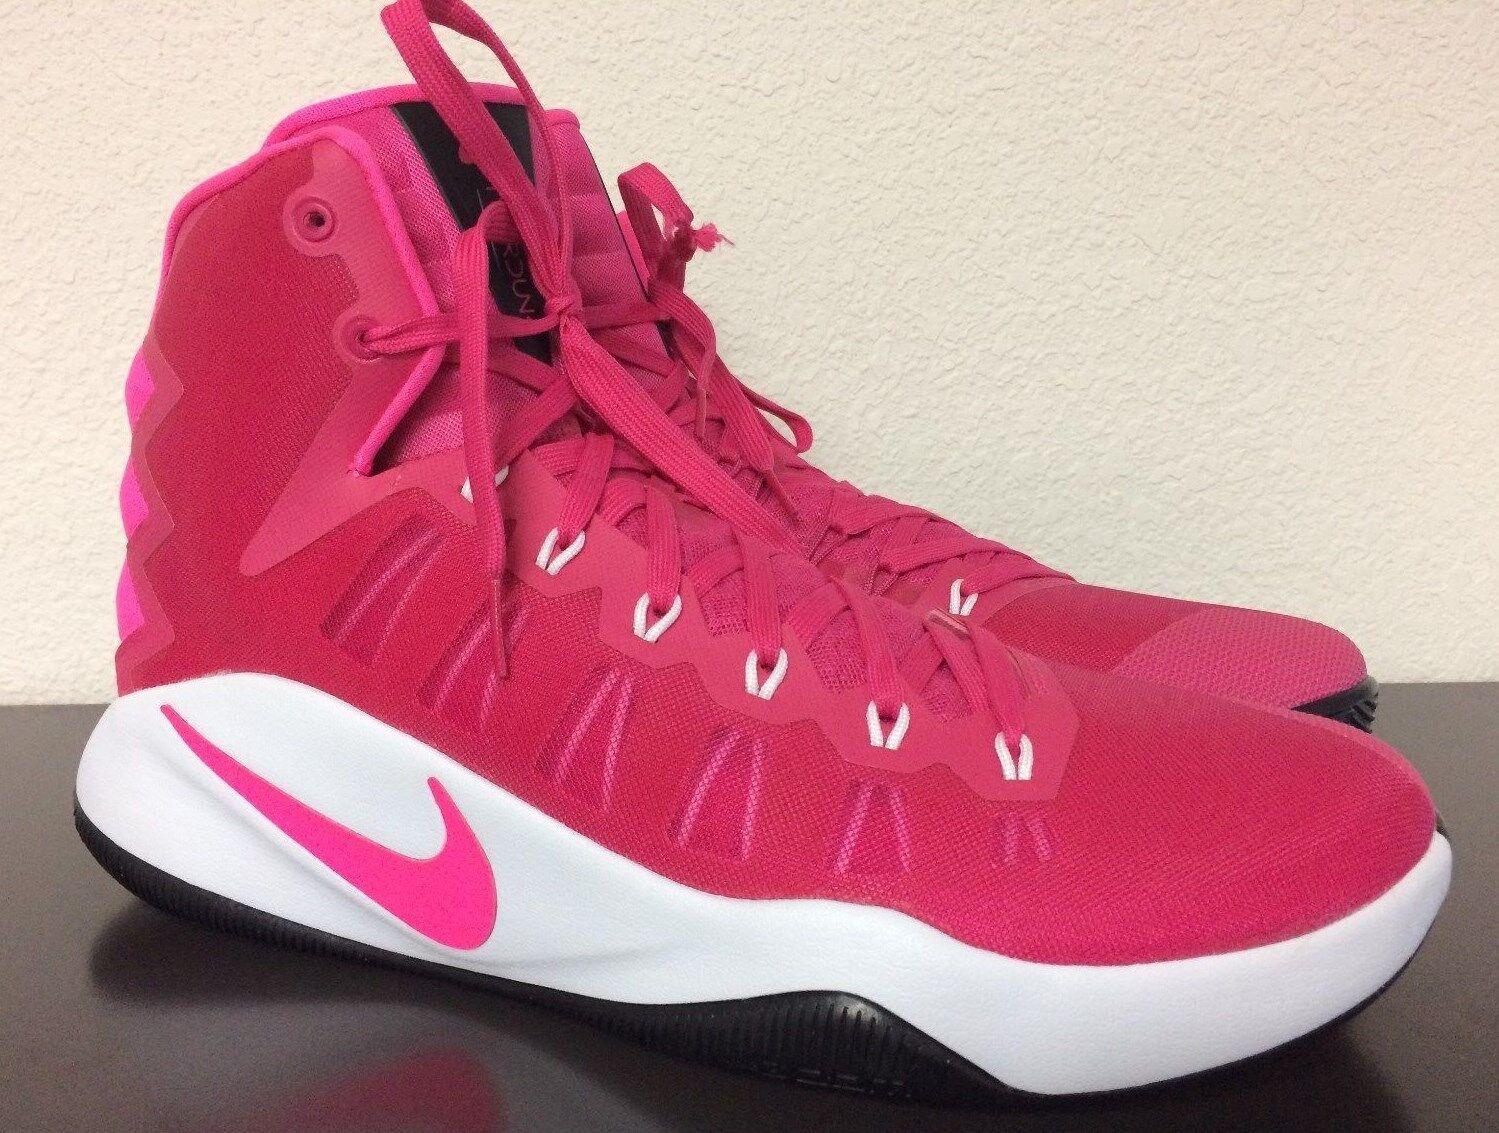 Nike Uomo hyperdunk 2016 vivida rosa basket scarpa, il cancro al seno consapevolezza 13